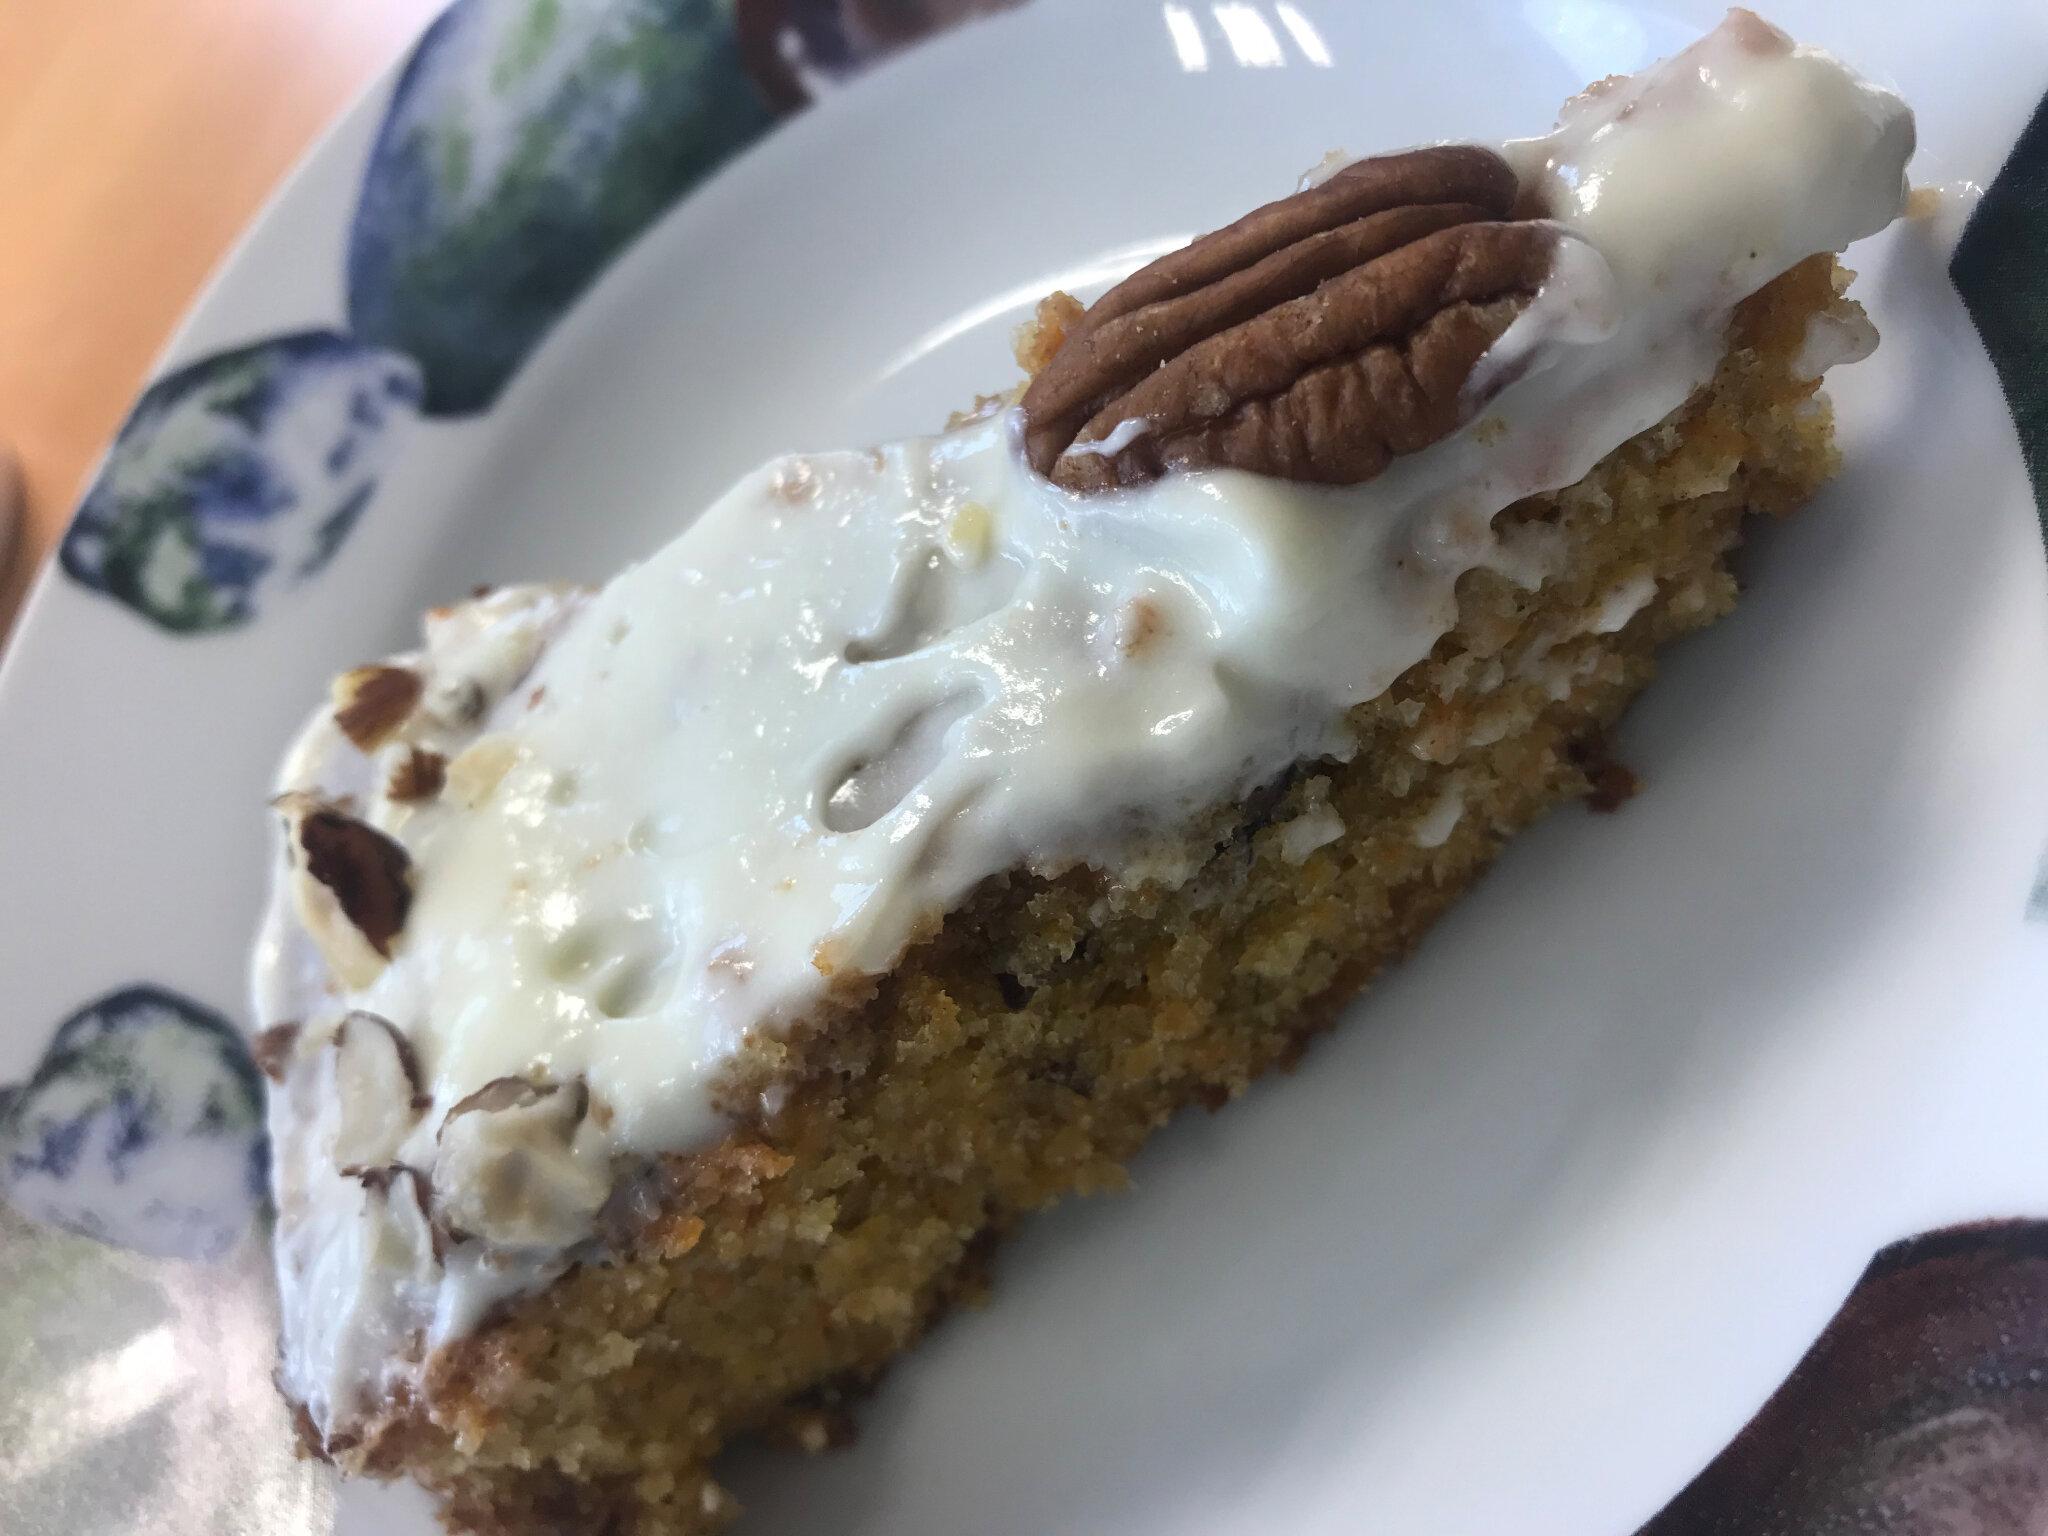 Carotte cake ma recette coup de coeur